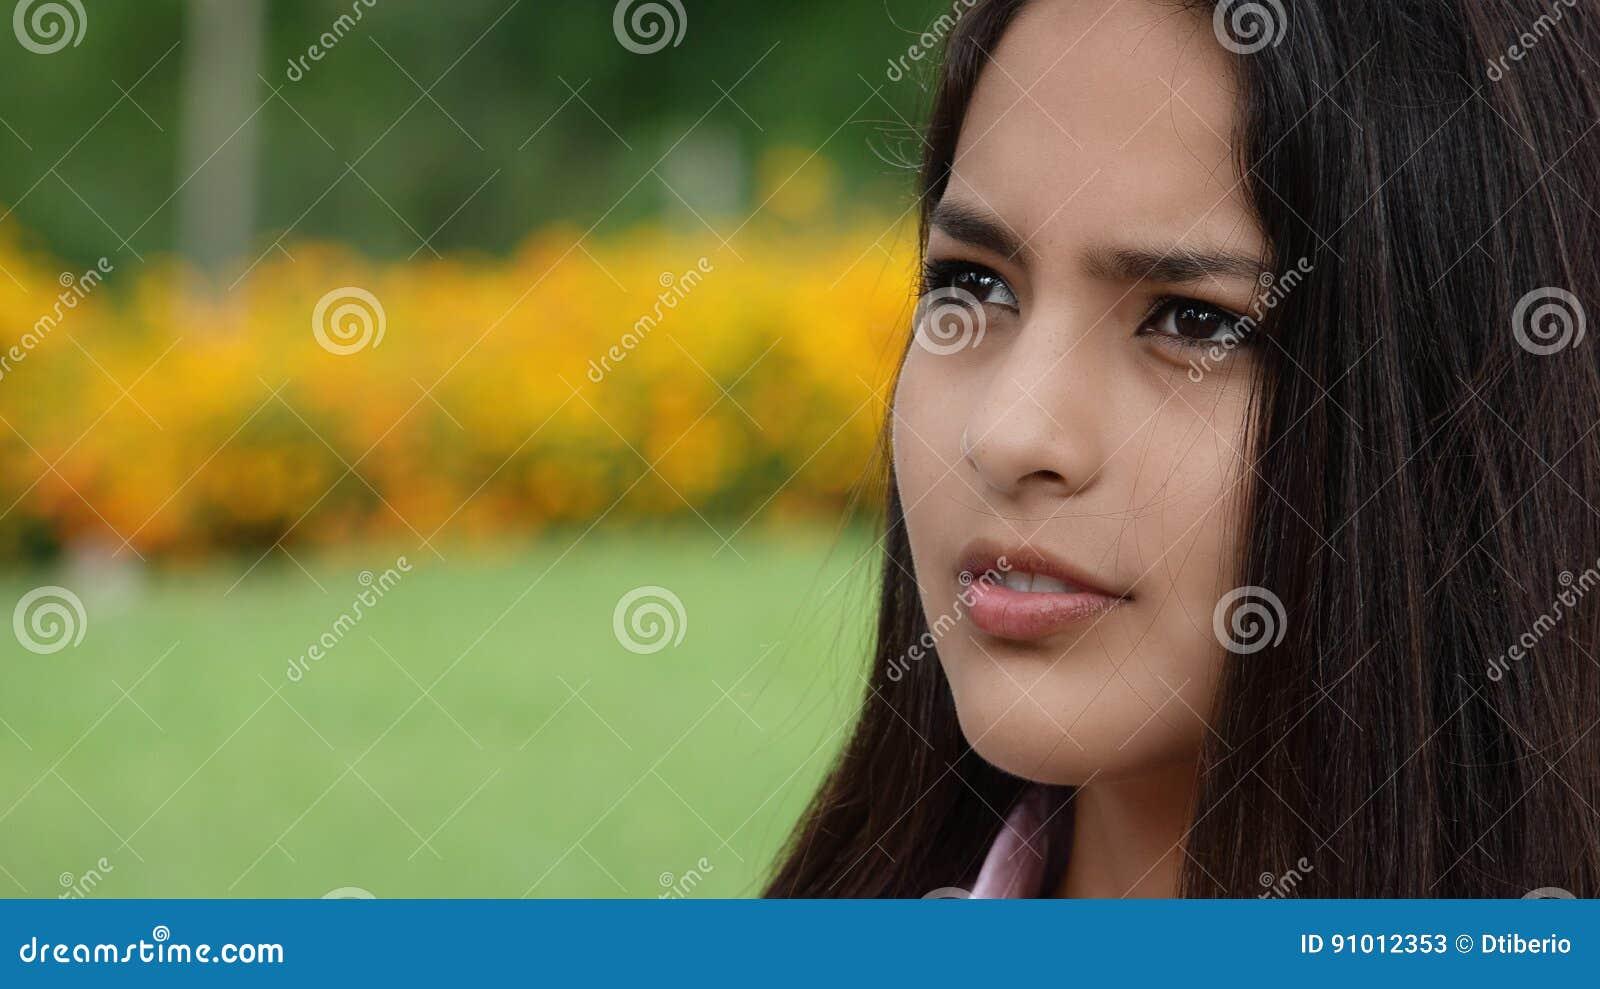 Hot girls from indiana university